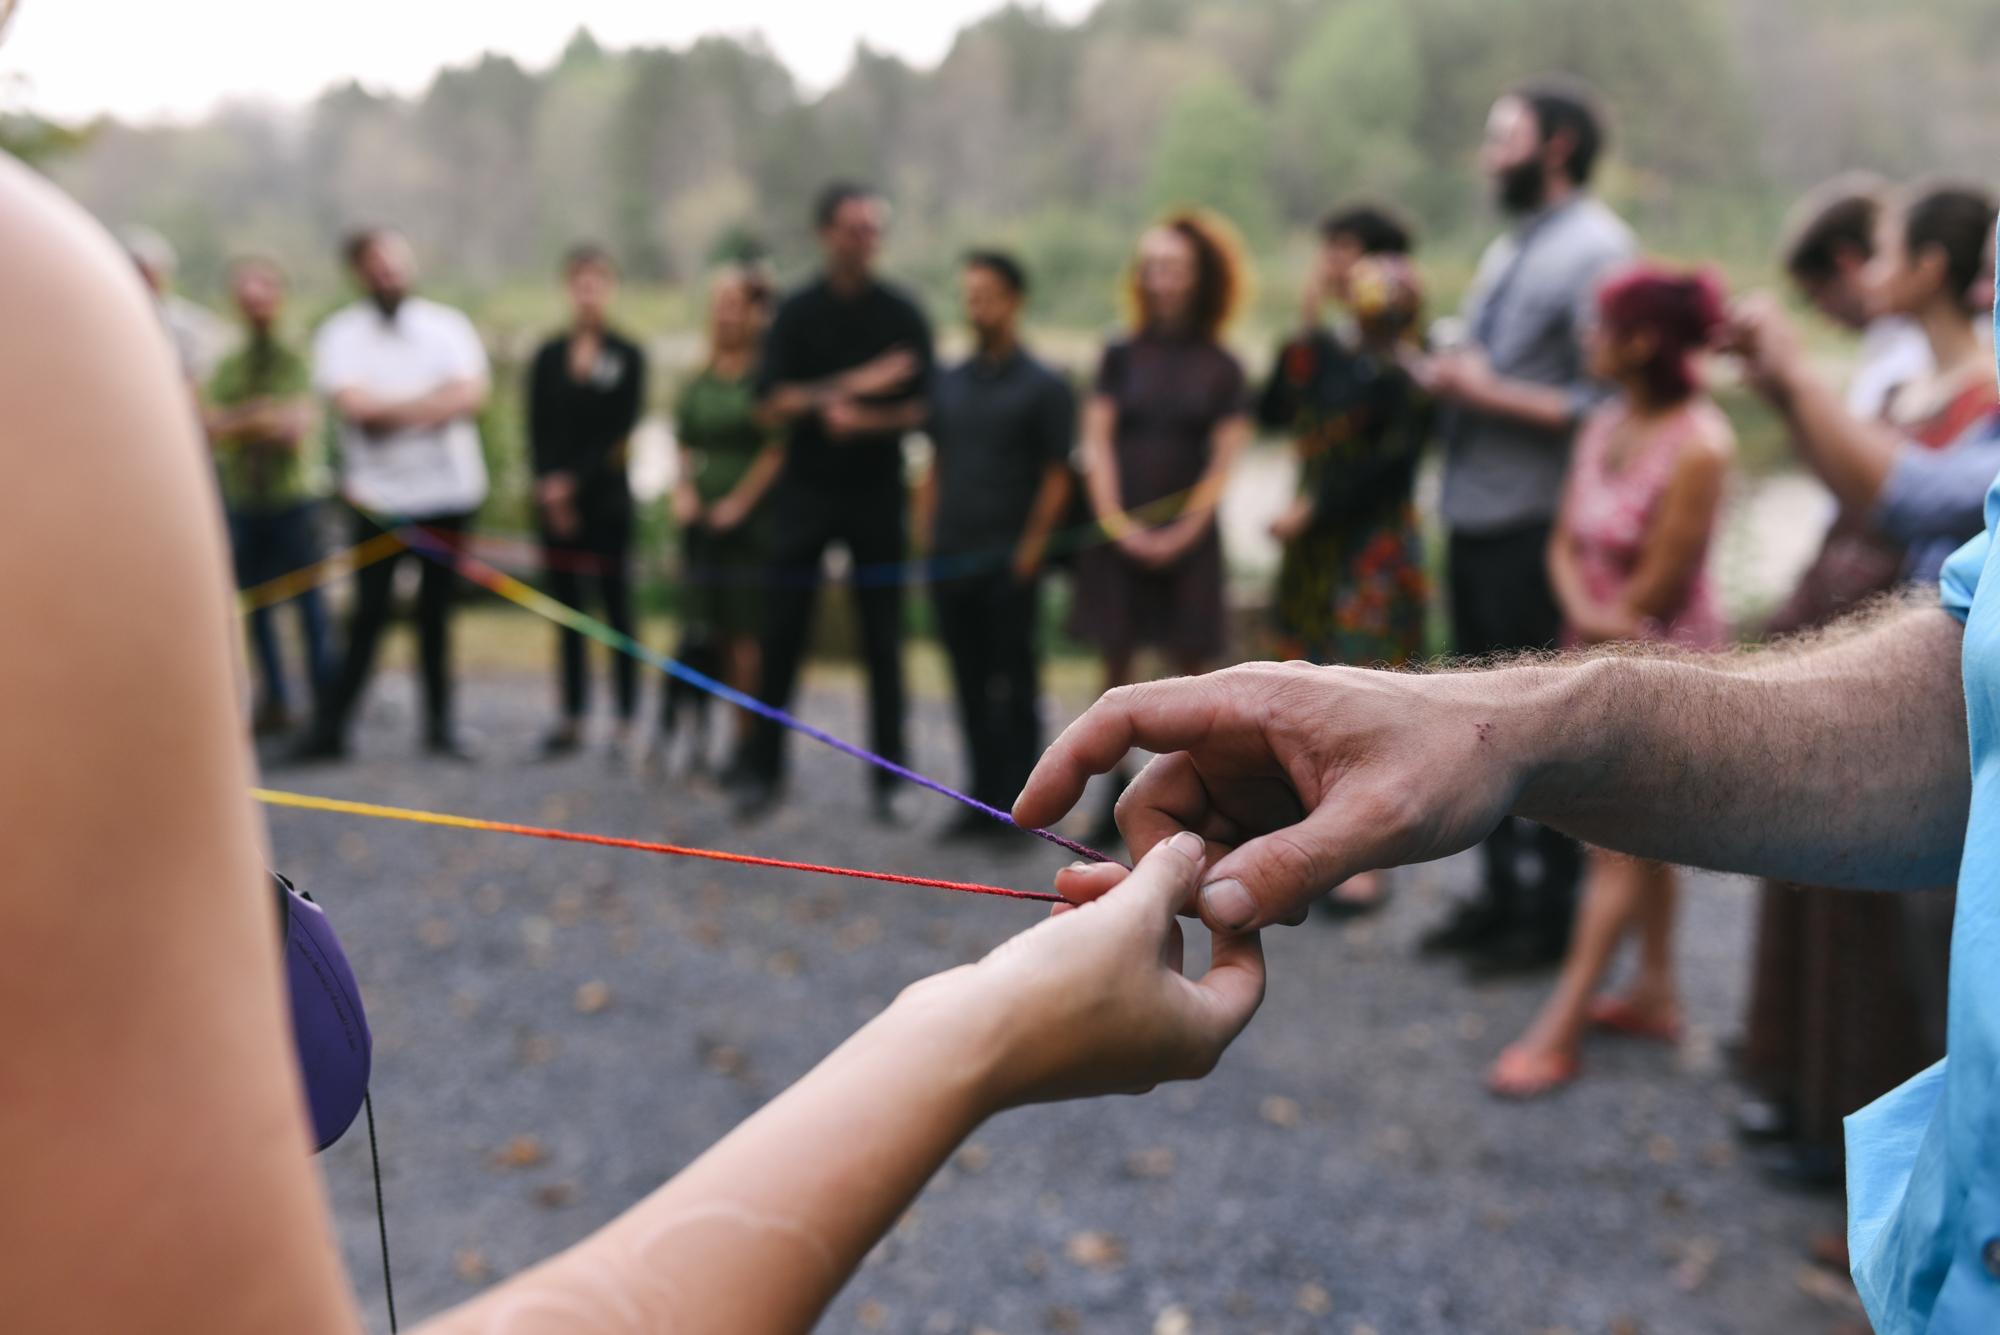 Mountain Wedding, Outdoors, Rustic, West Virginia, Maryland Wedding Photographer, DIY, Casual, guests passing rainbow yarn, yarn weaving ceremony